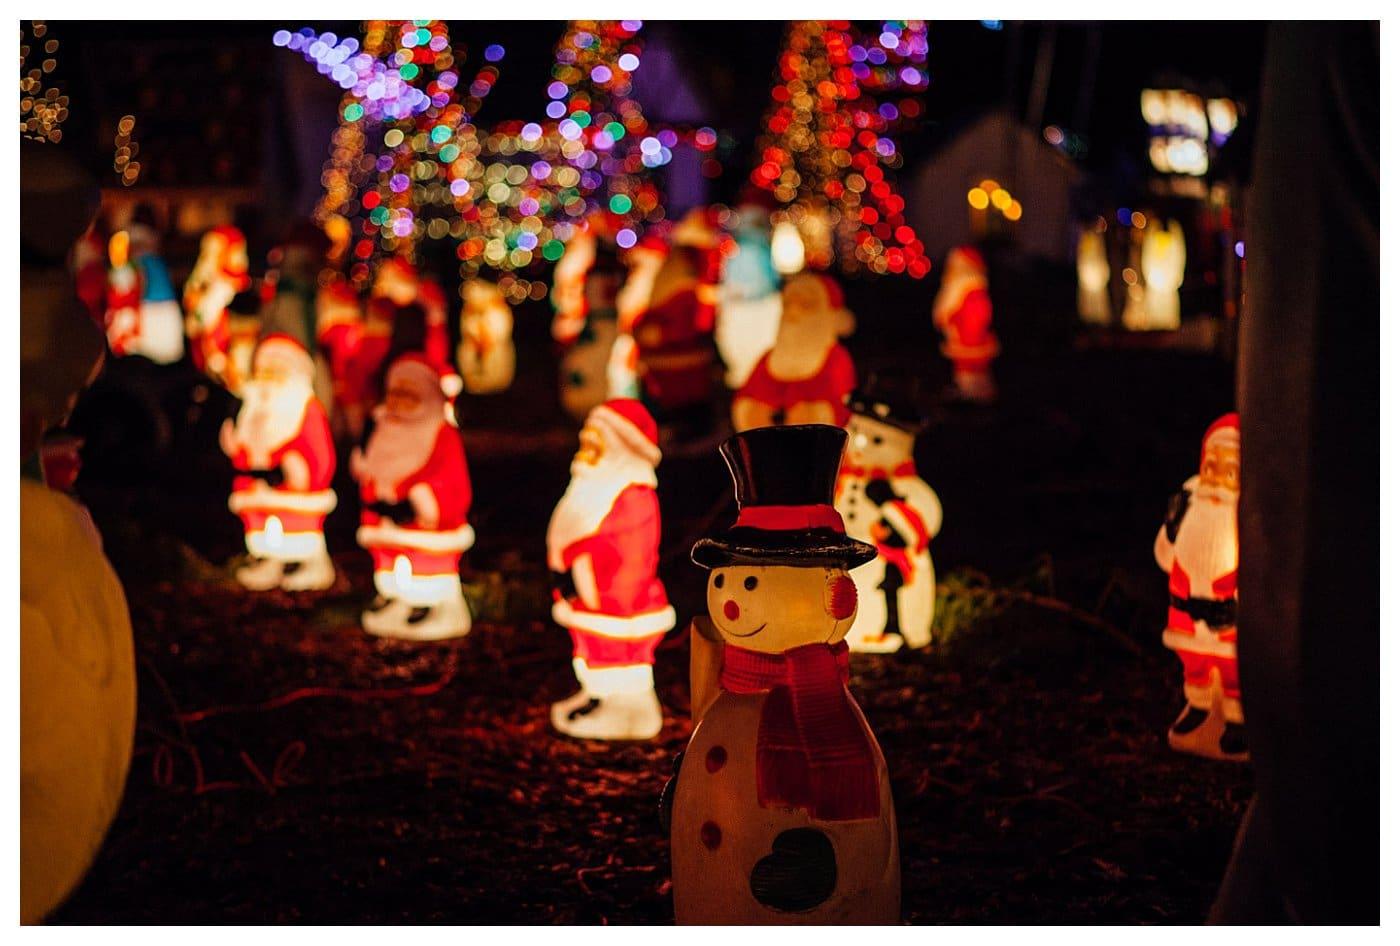 Stanley Park Christmas